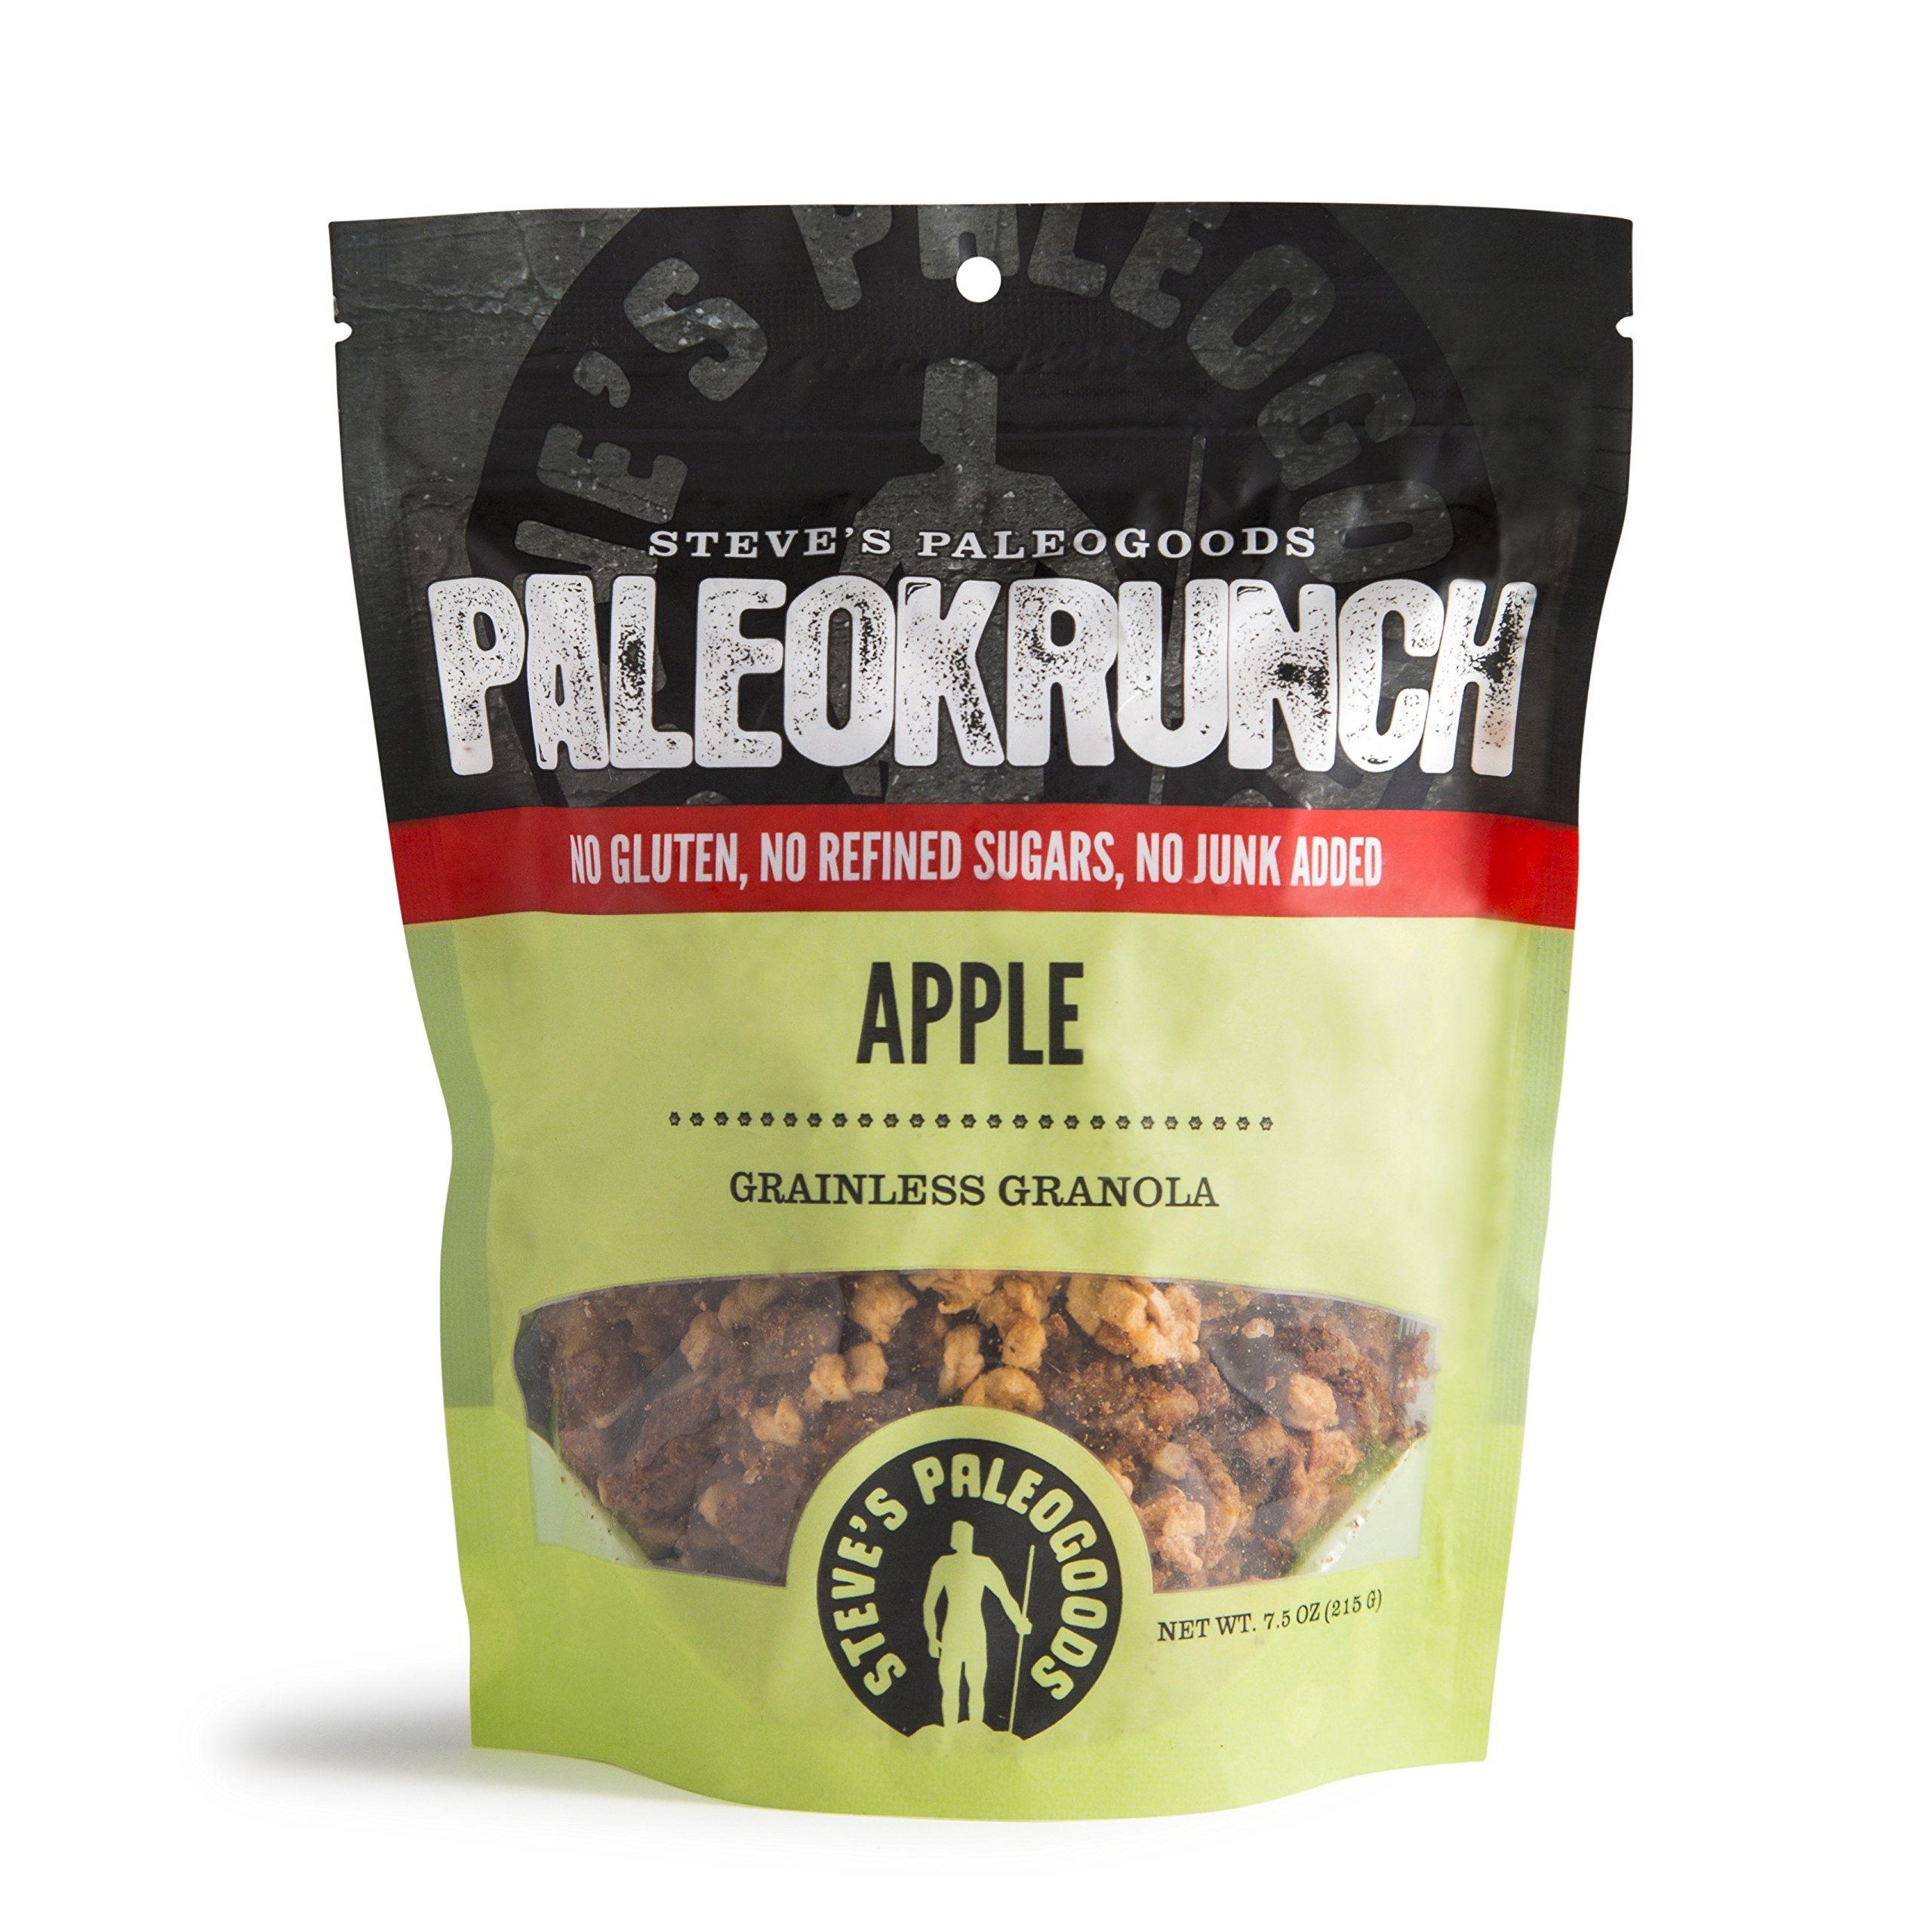 Steve's PaleoGoods, PaleoKrunch Cereal Apple Pie, 7.5 oz